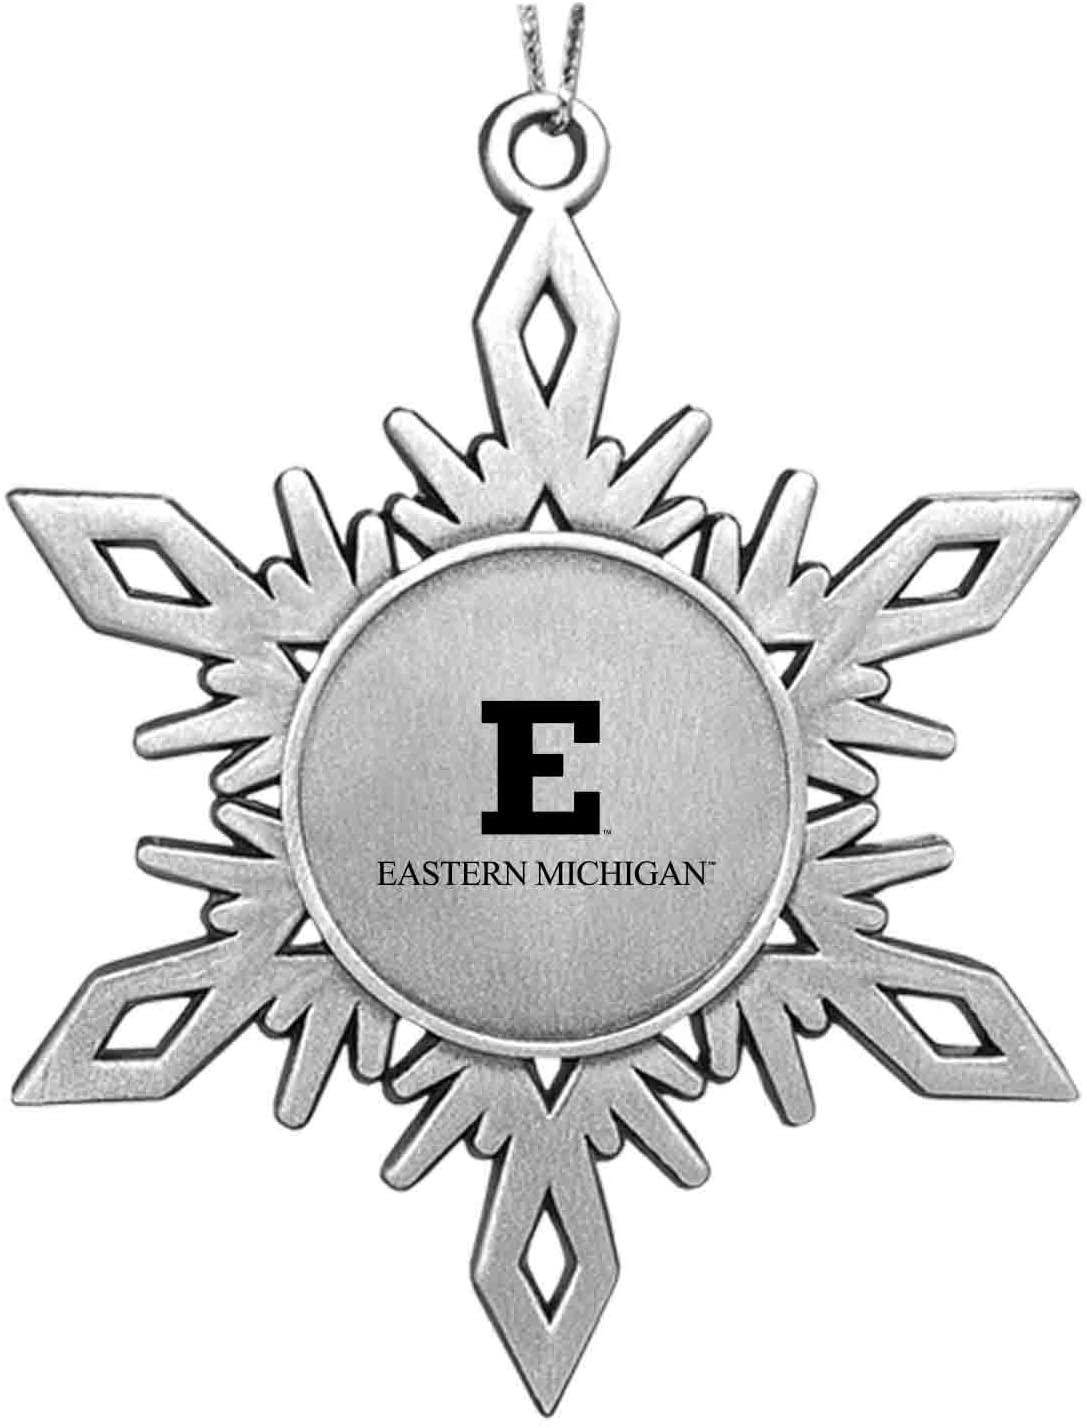 LXG, Inc. Eastern Michigan University Snowflake Ornament Pewter